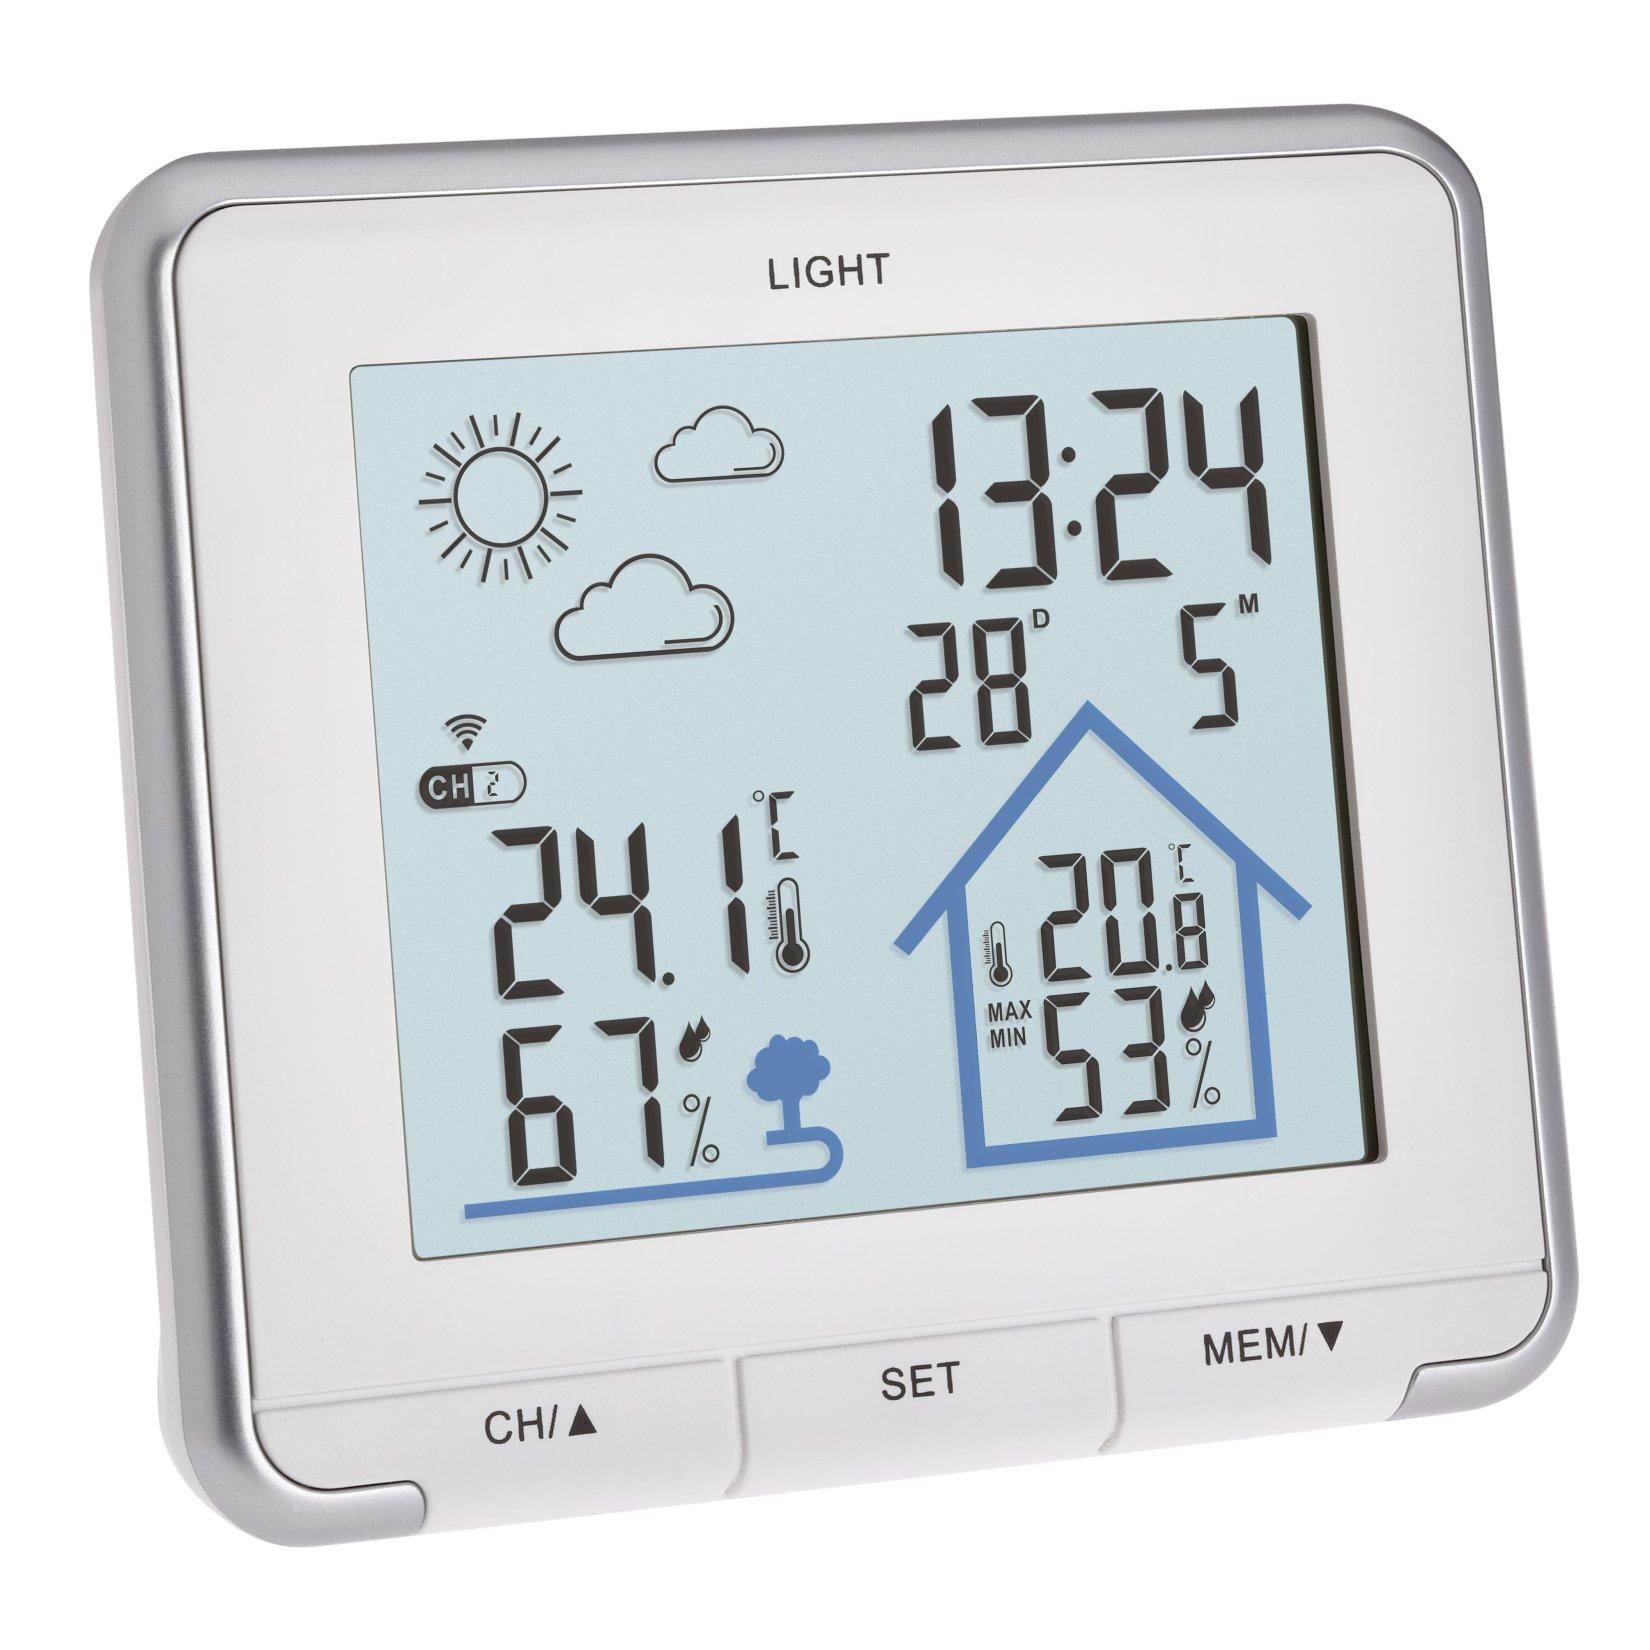 Radio controlled weather station LIFE white